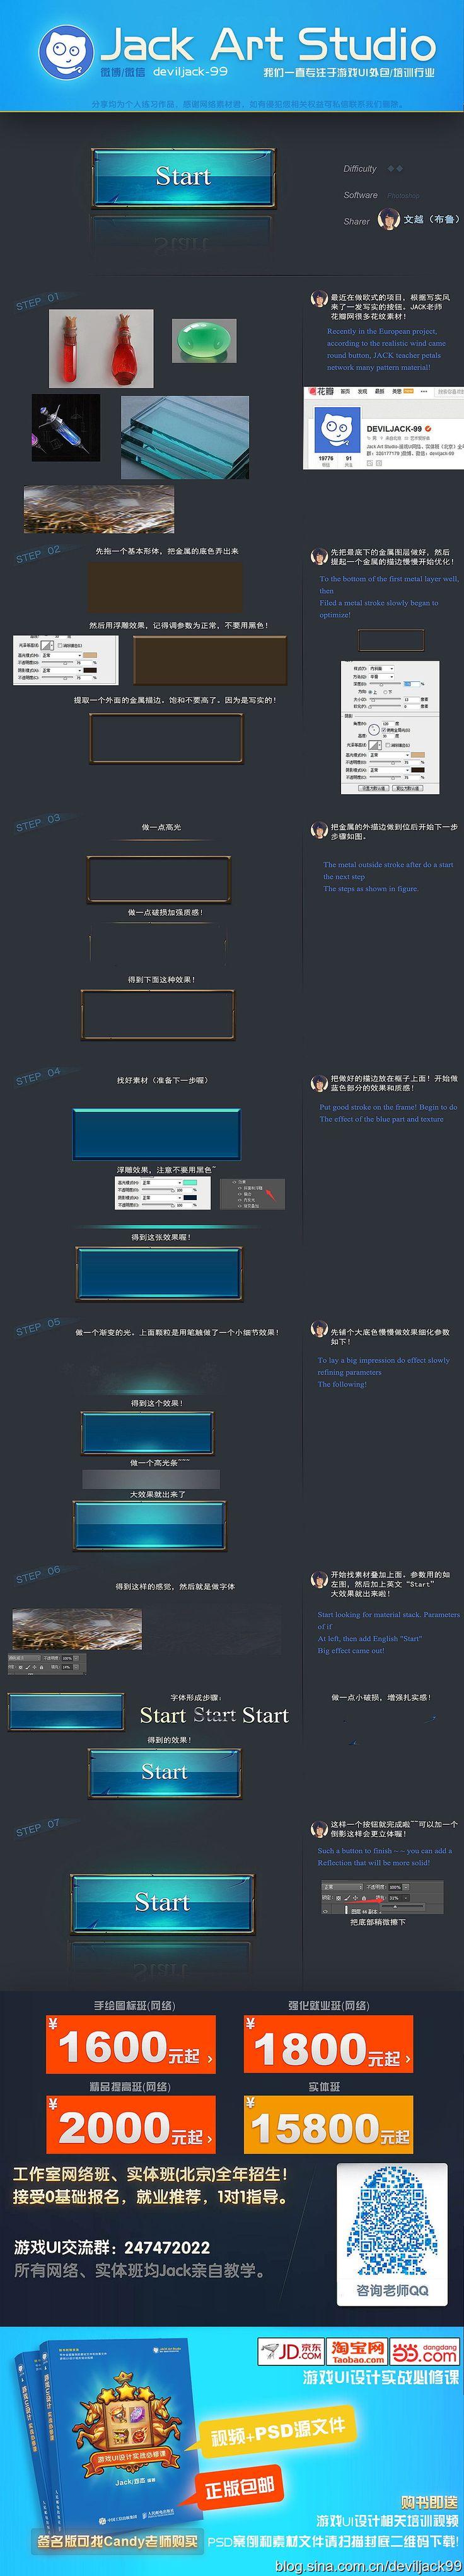 Jack 游戏ui网络、实体班全年招生 /game ui/游戏UI/设计/图标/界面交互/游戏设计/平面/手游/资源/App/icon/logo/GUI/UE//UI控件/ui资源/游戏教程/徽章/游戏按钮/ui/教程 P站:https://www.pinterest.com/deviljack99/ B站:https://www.behance.net/Deviljack-99